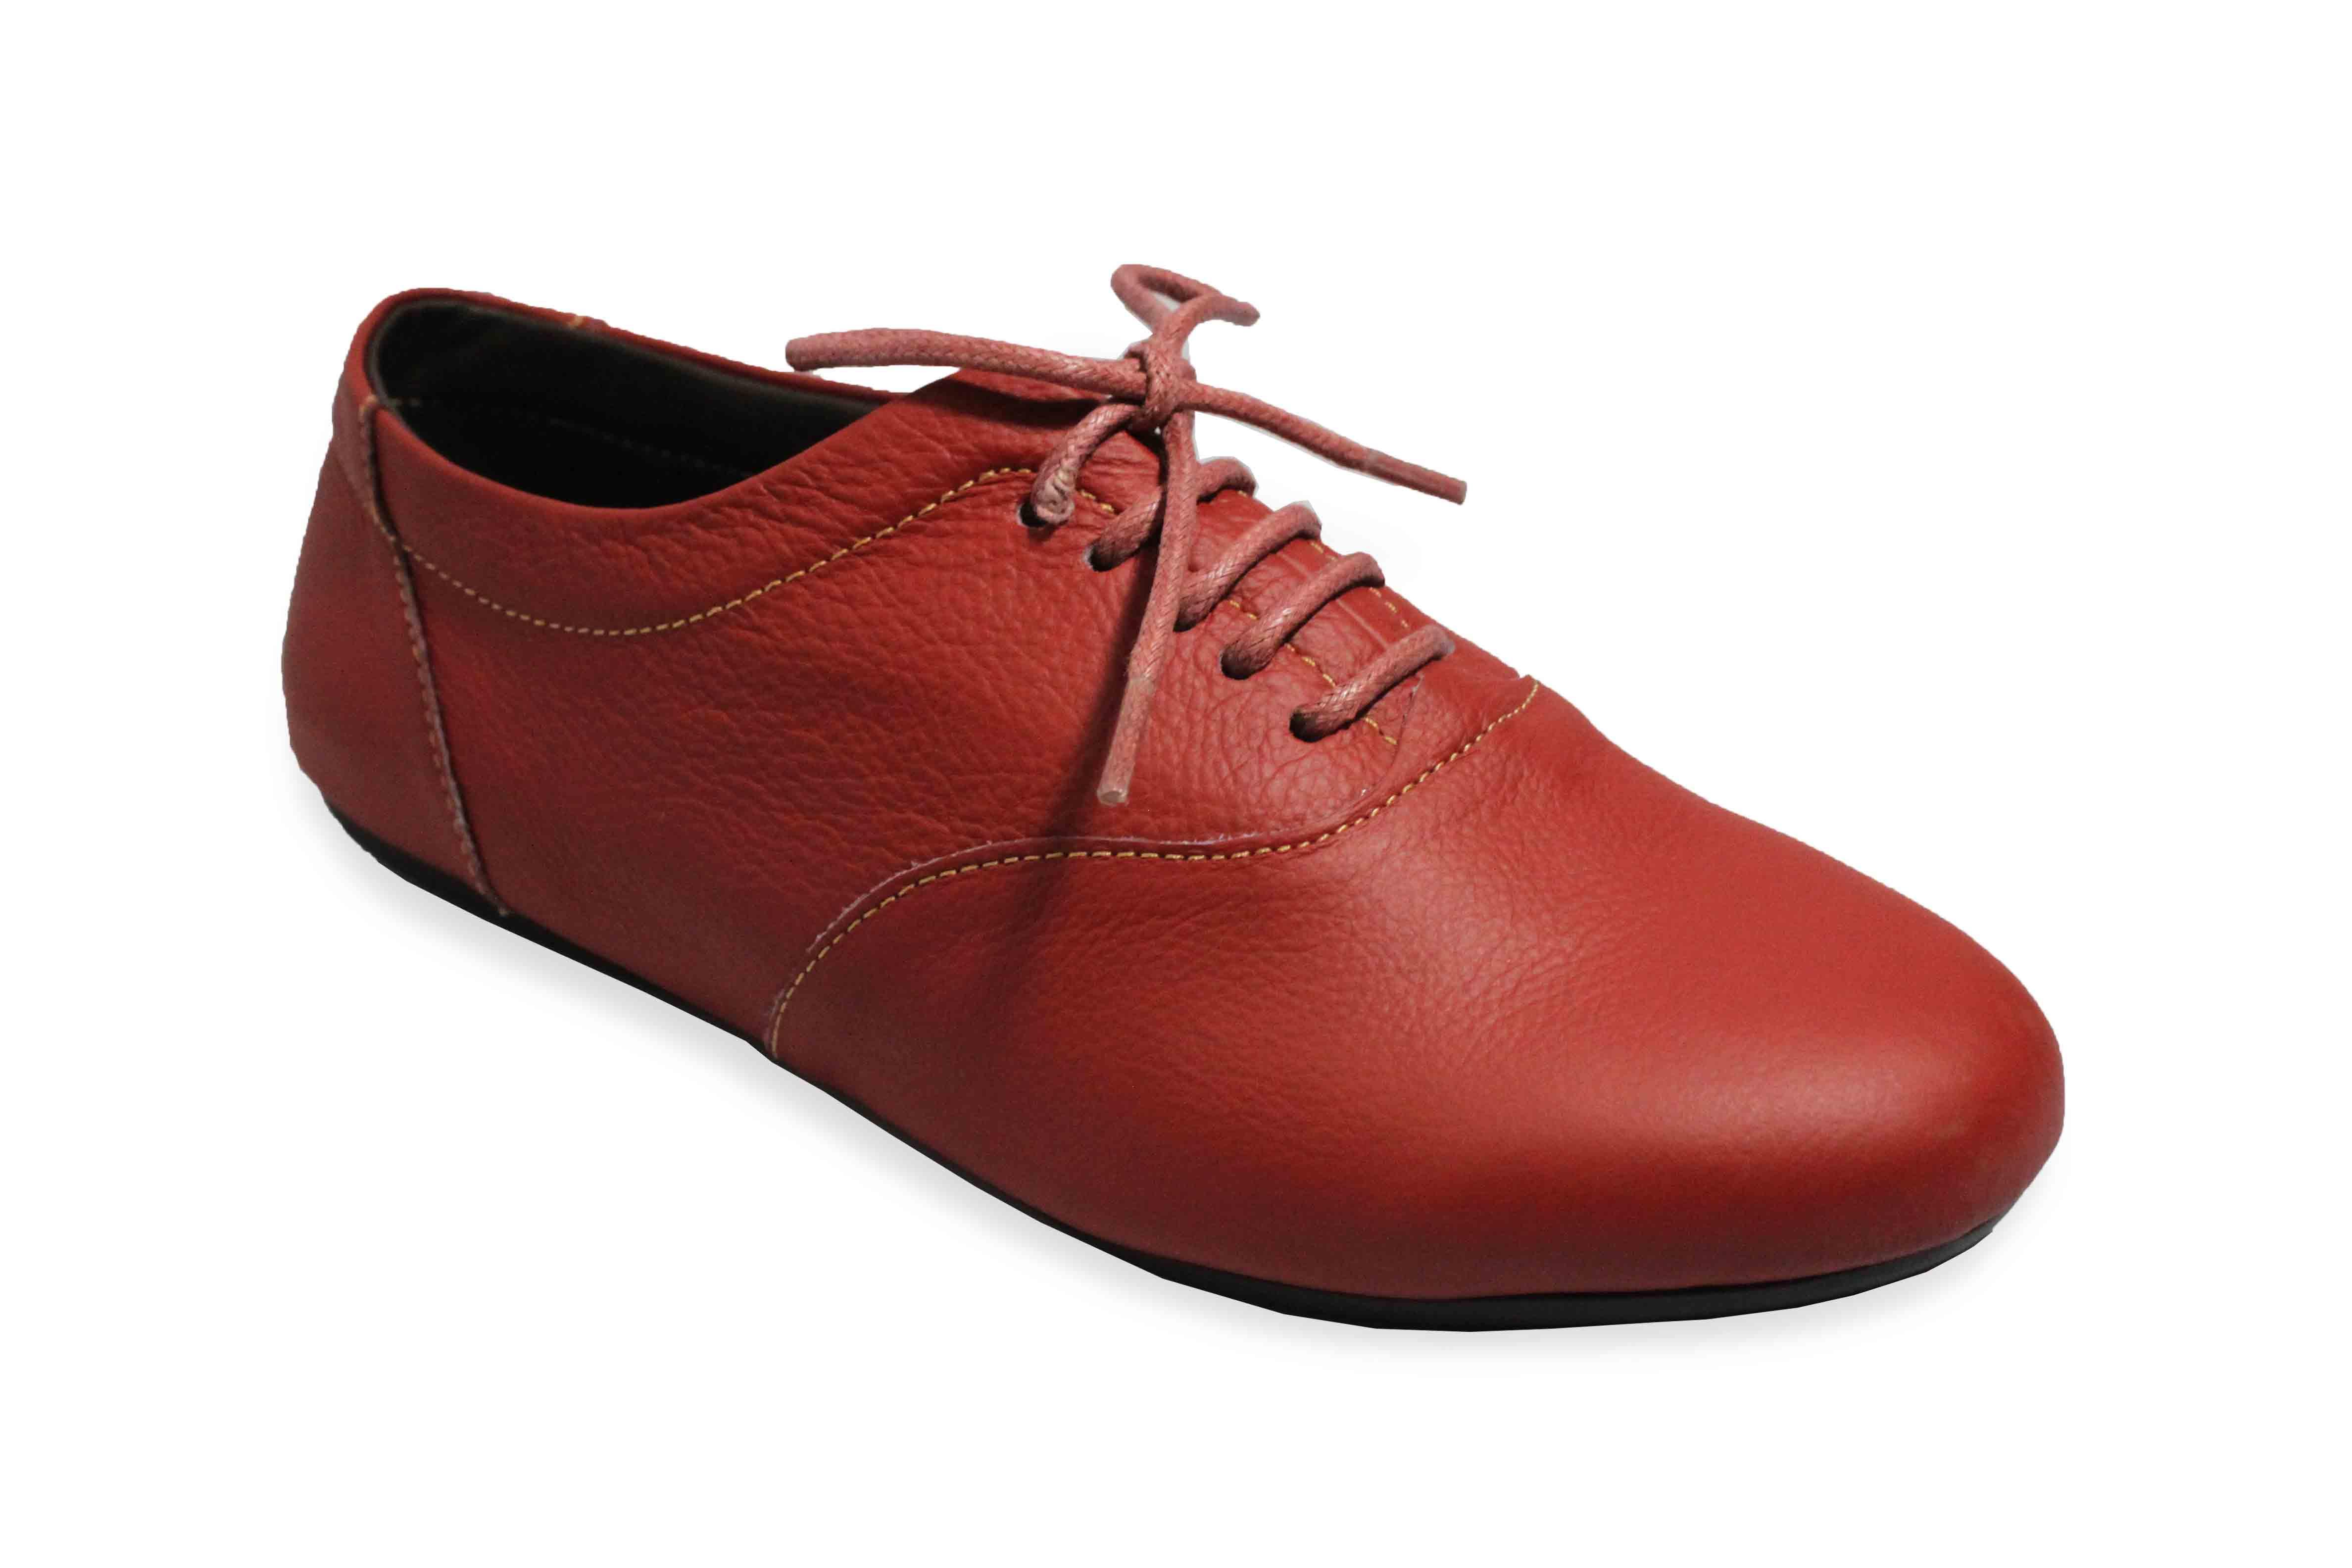 giày oxford da đỏ